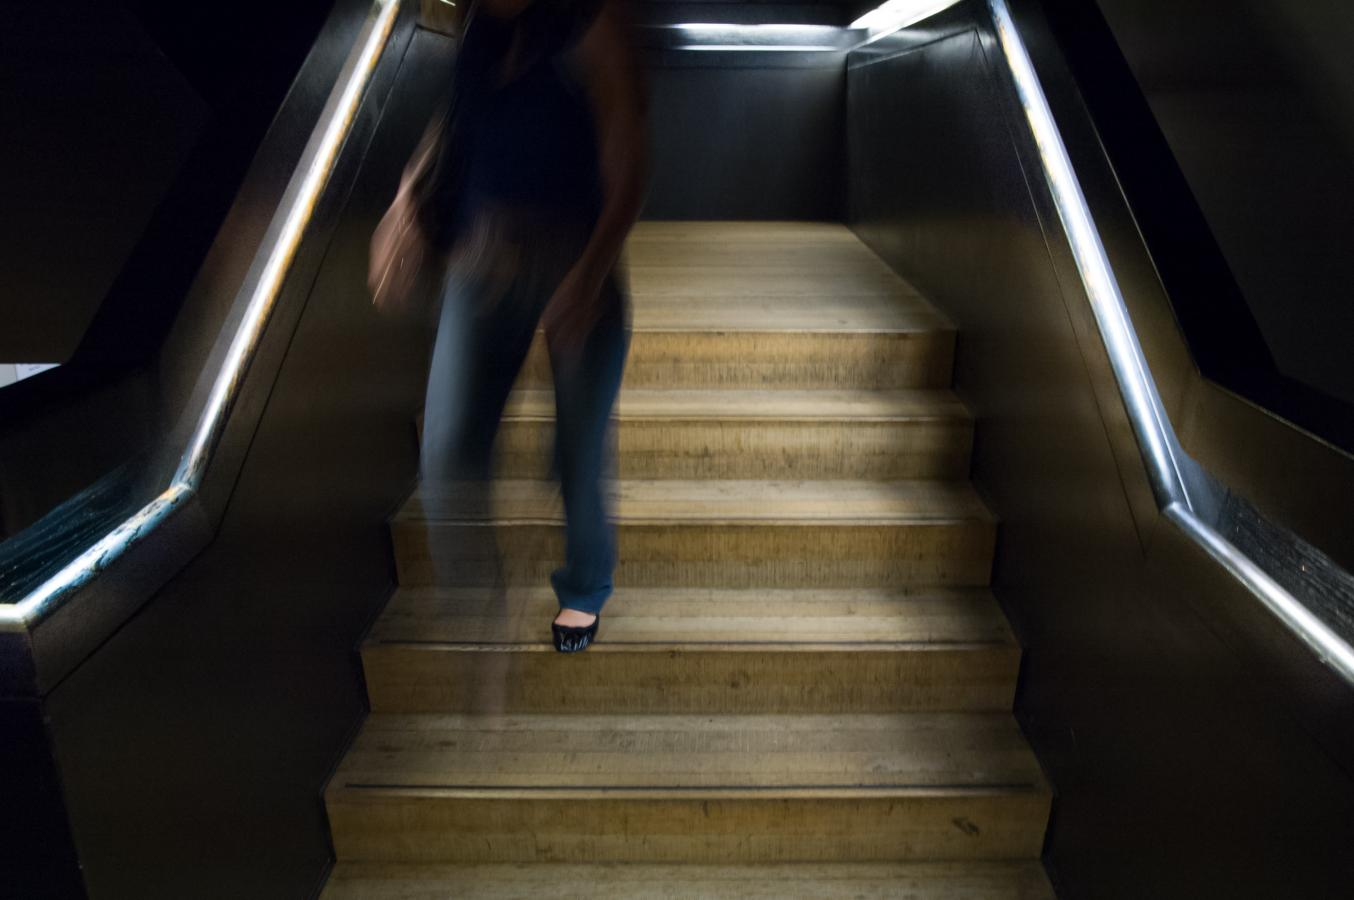 stairs-tate-modern-london-2007